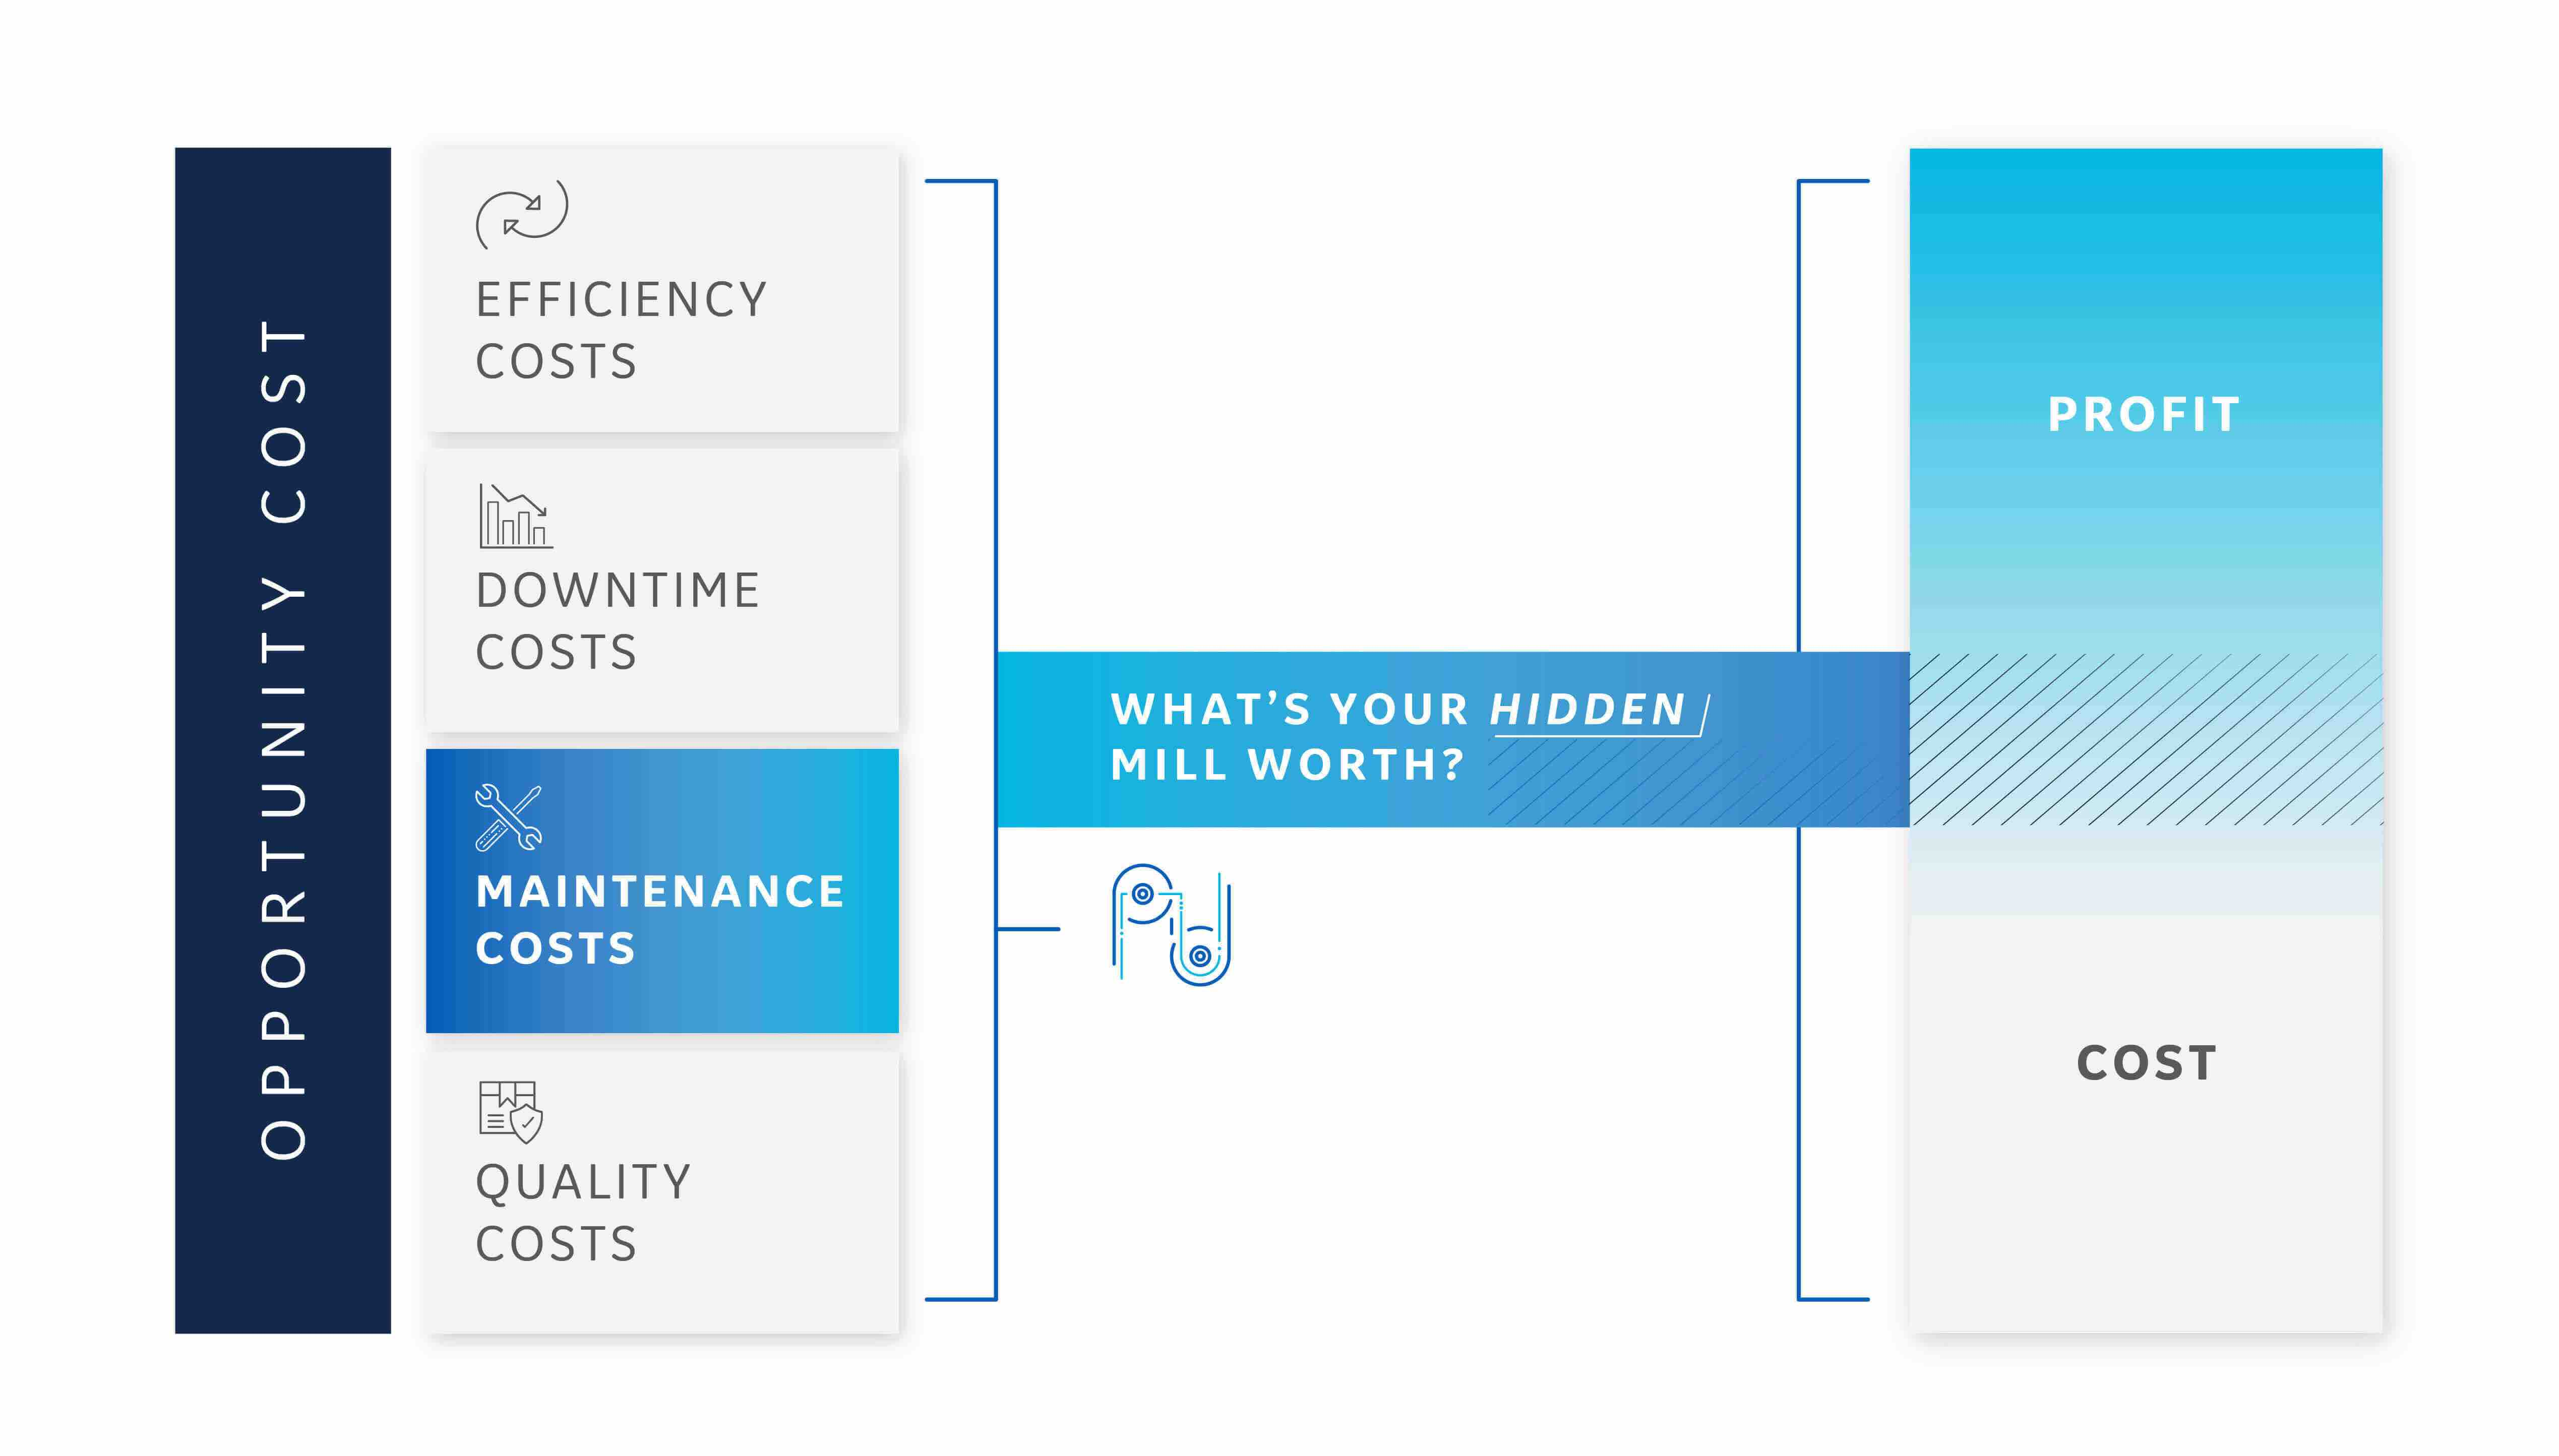 Efficiency costs in the Steel Industry graphic   GE Digital